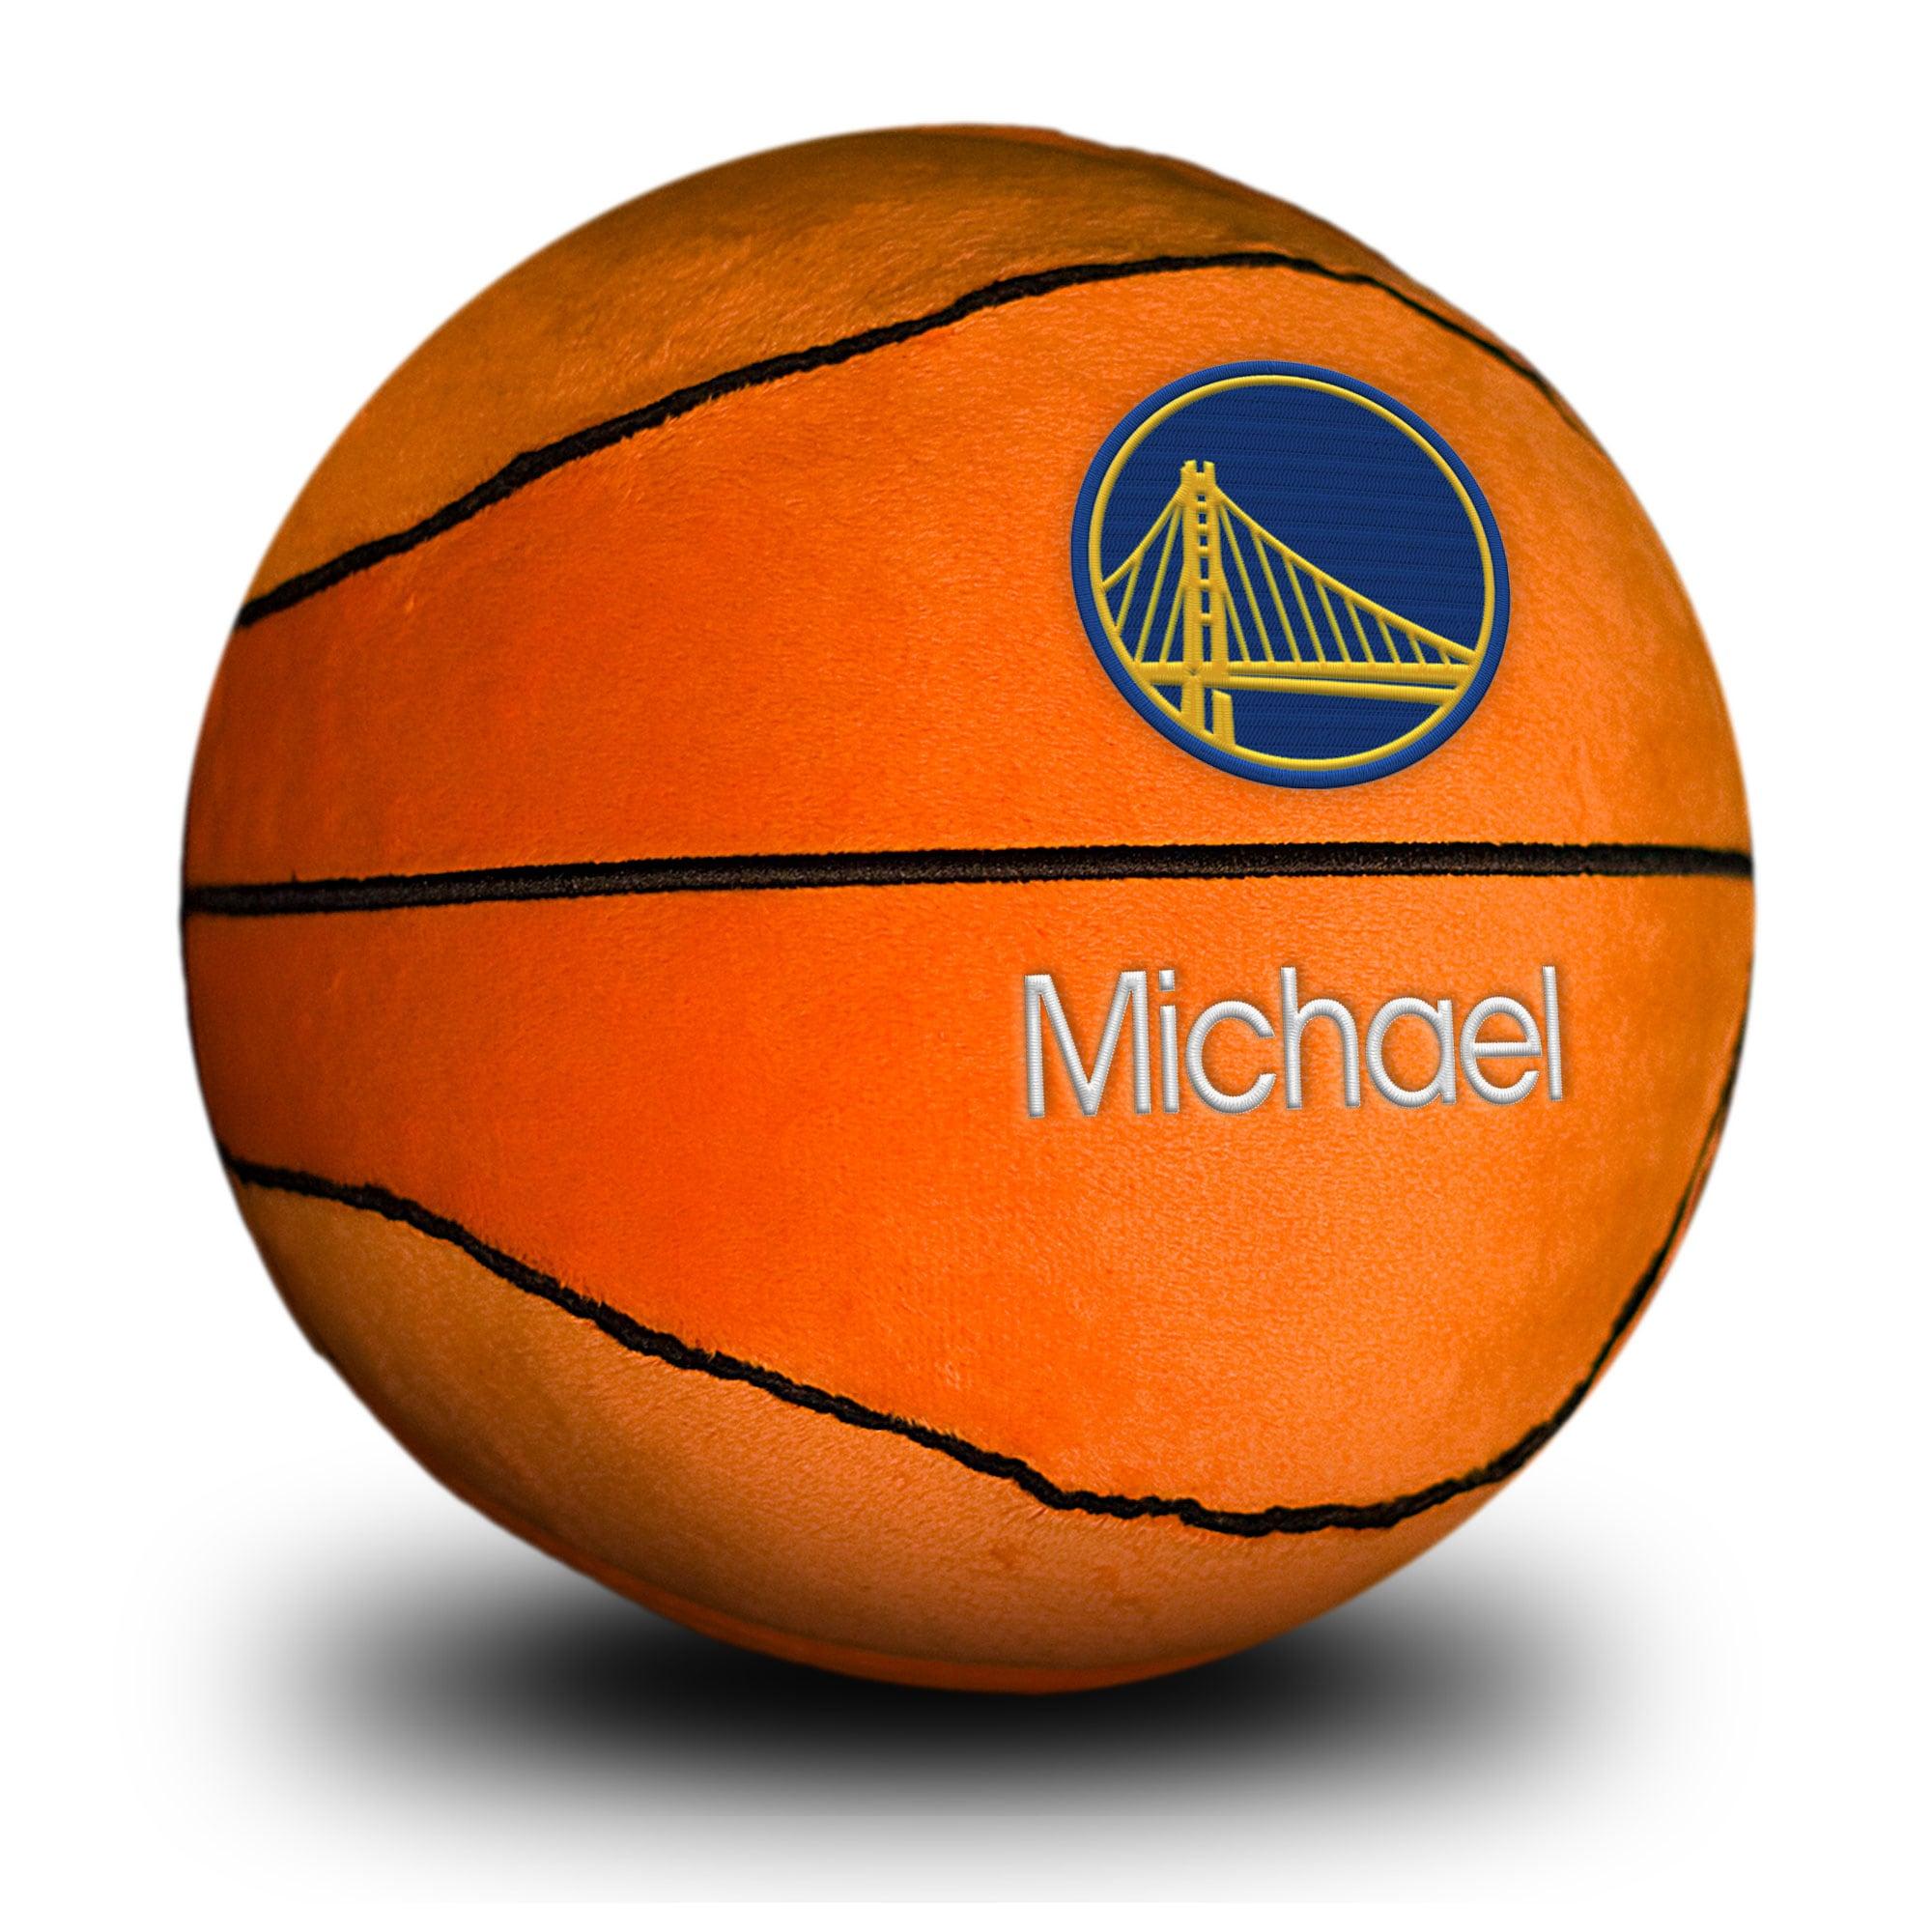 Golden State Warriors Personalized Plush Baby Basketball - Orange